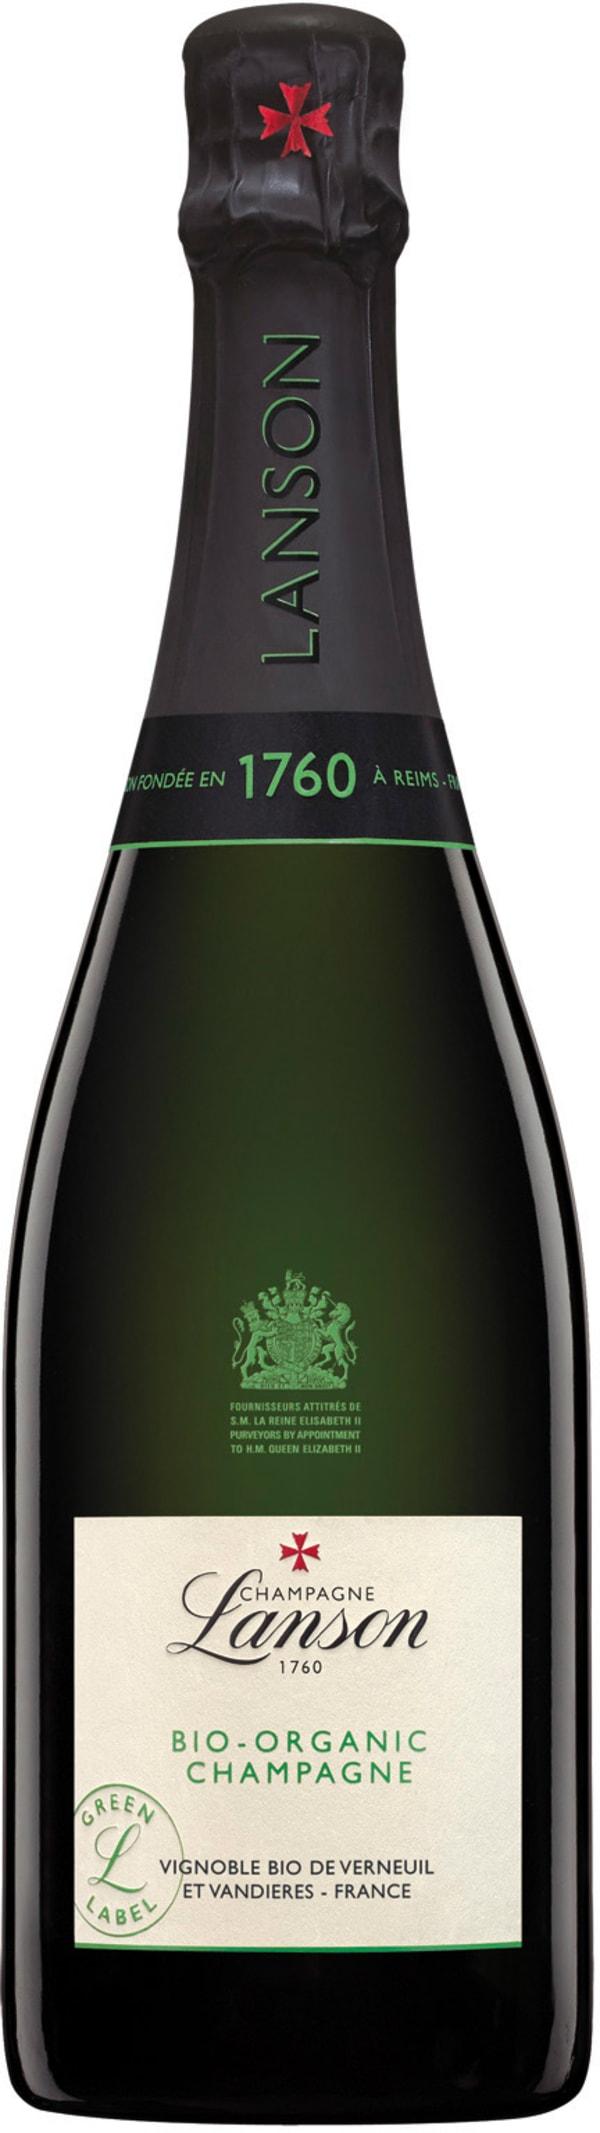 Lanson Green Label Organic Champagne Brut